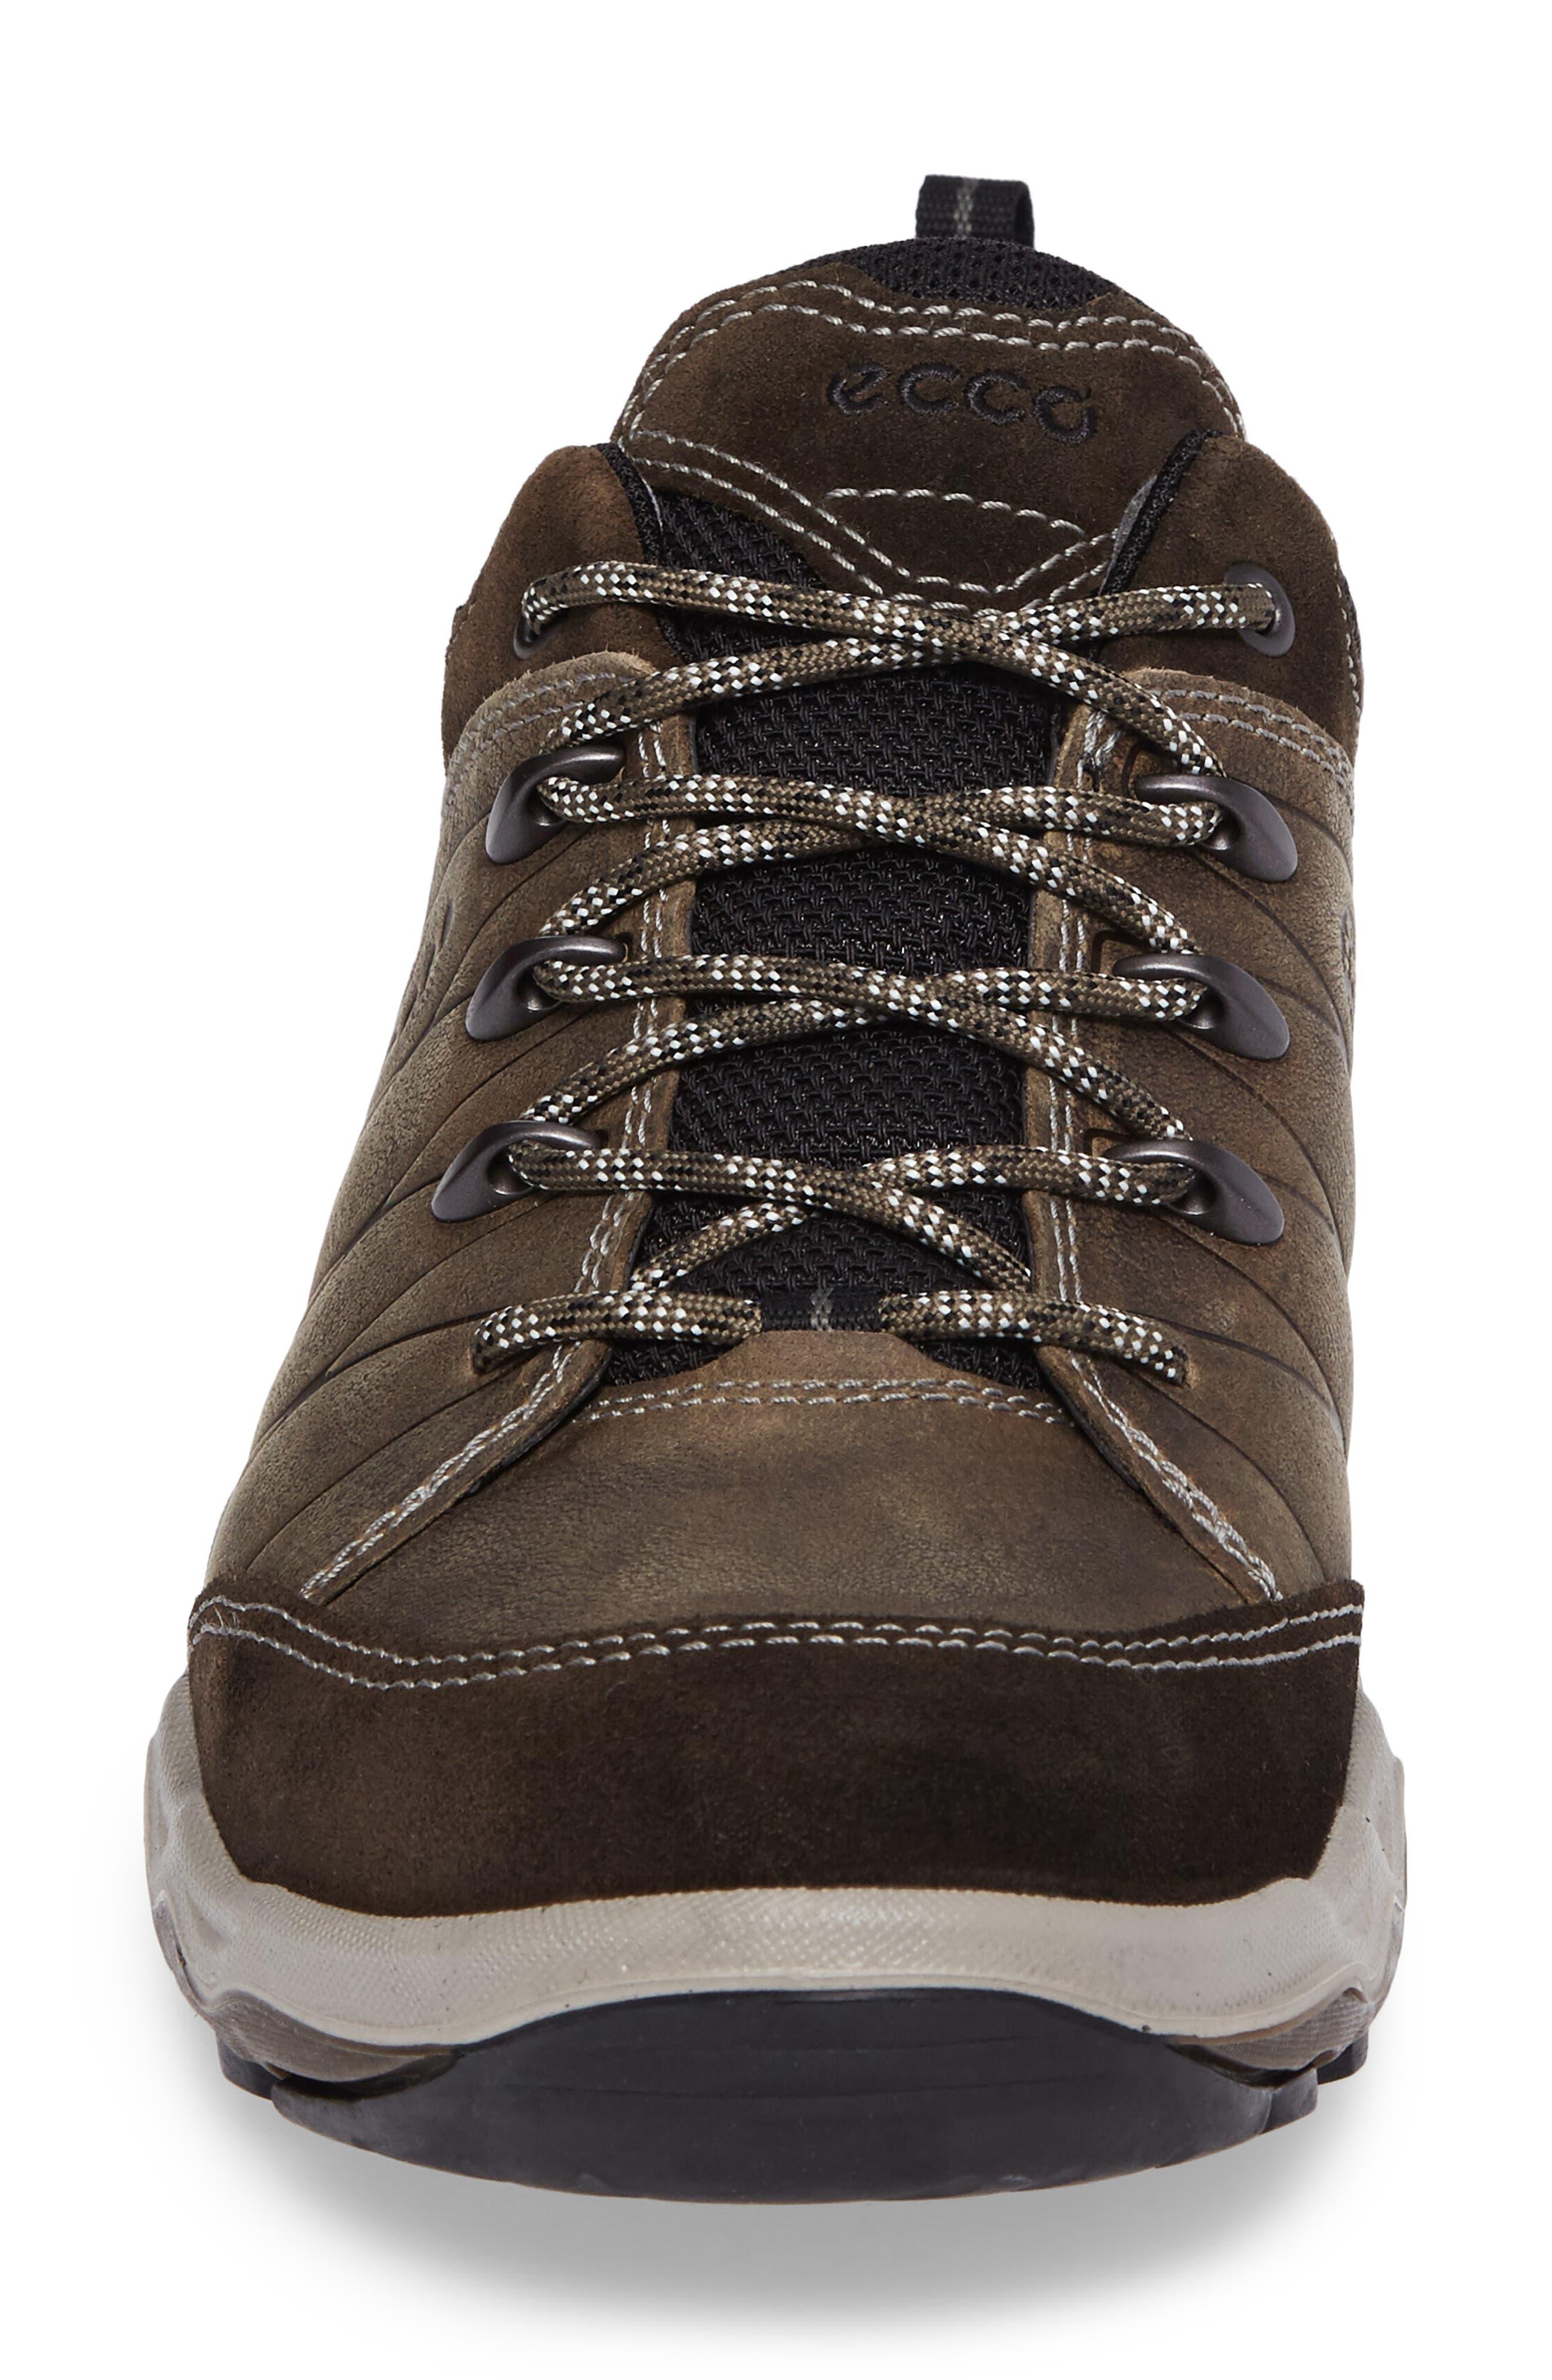 Ulterra GTX Sneaker,                             Alternate thumbnail 4, color,                             Tarmac Suede